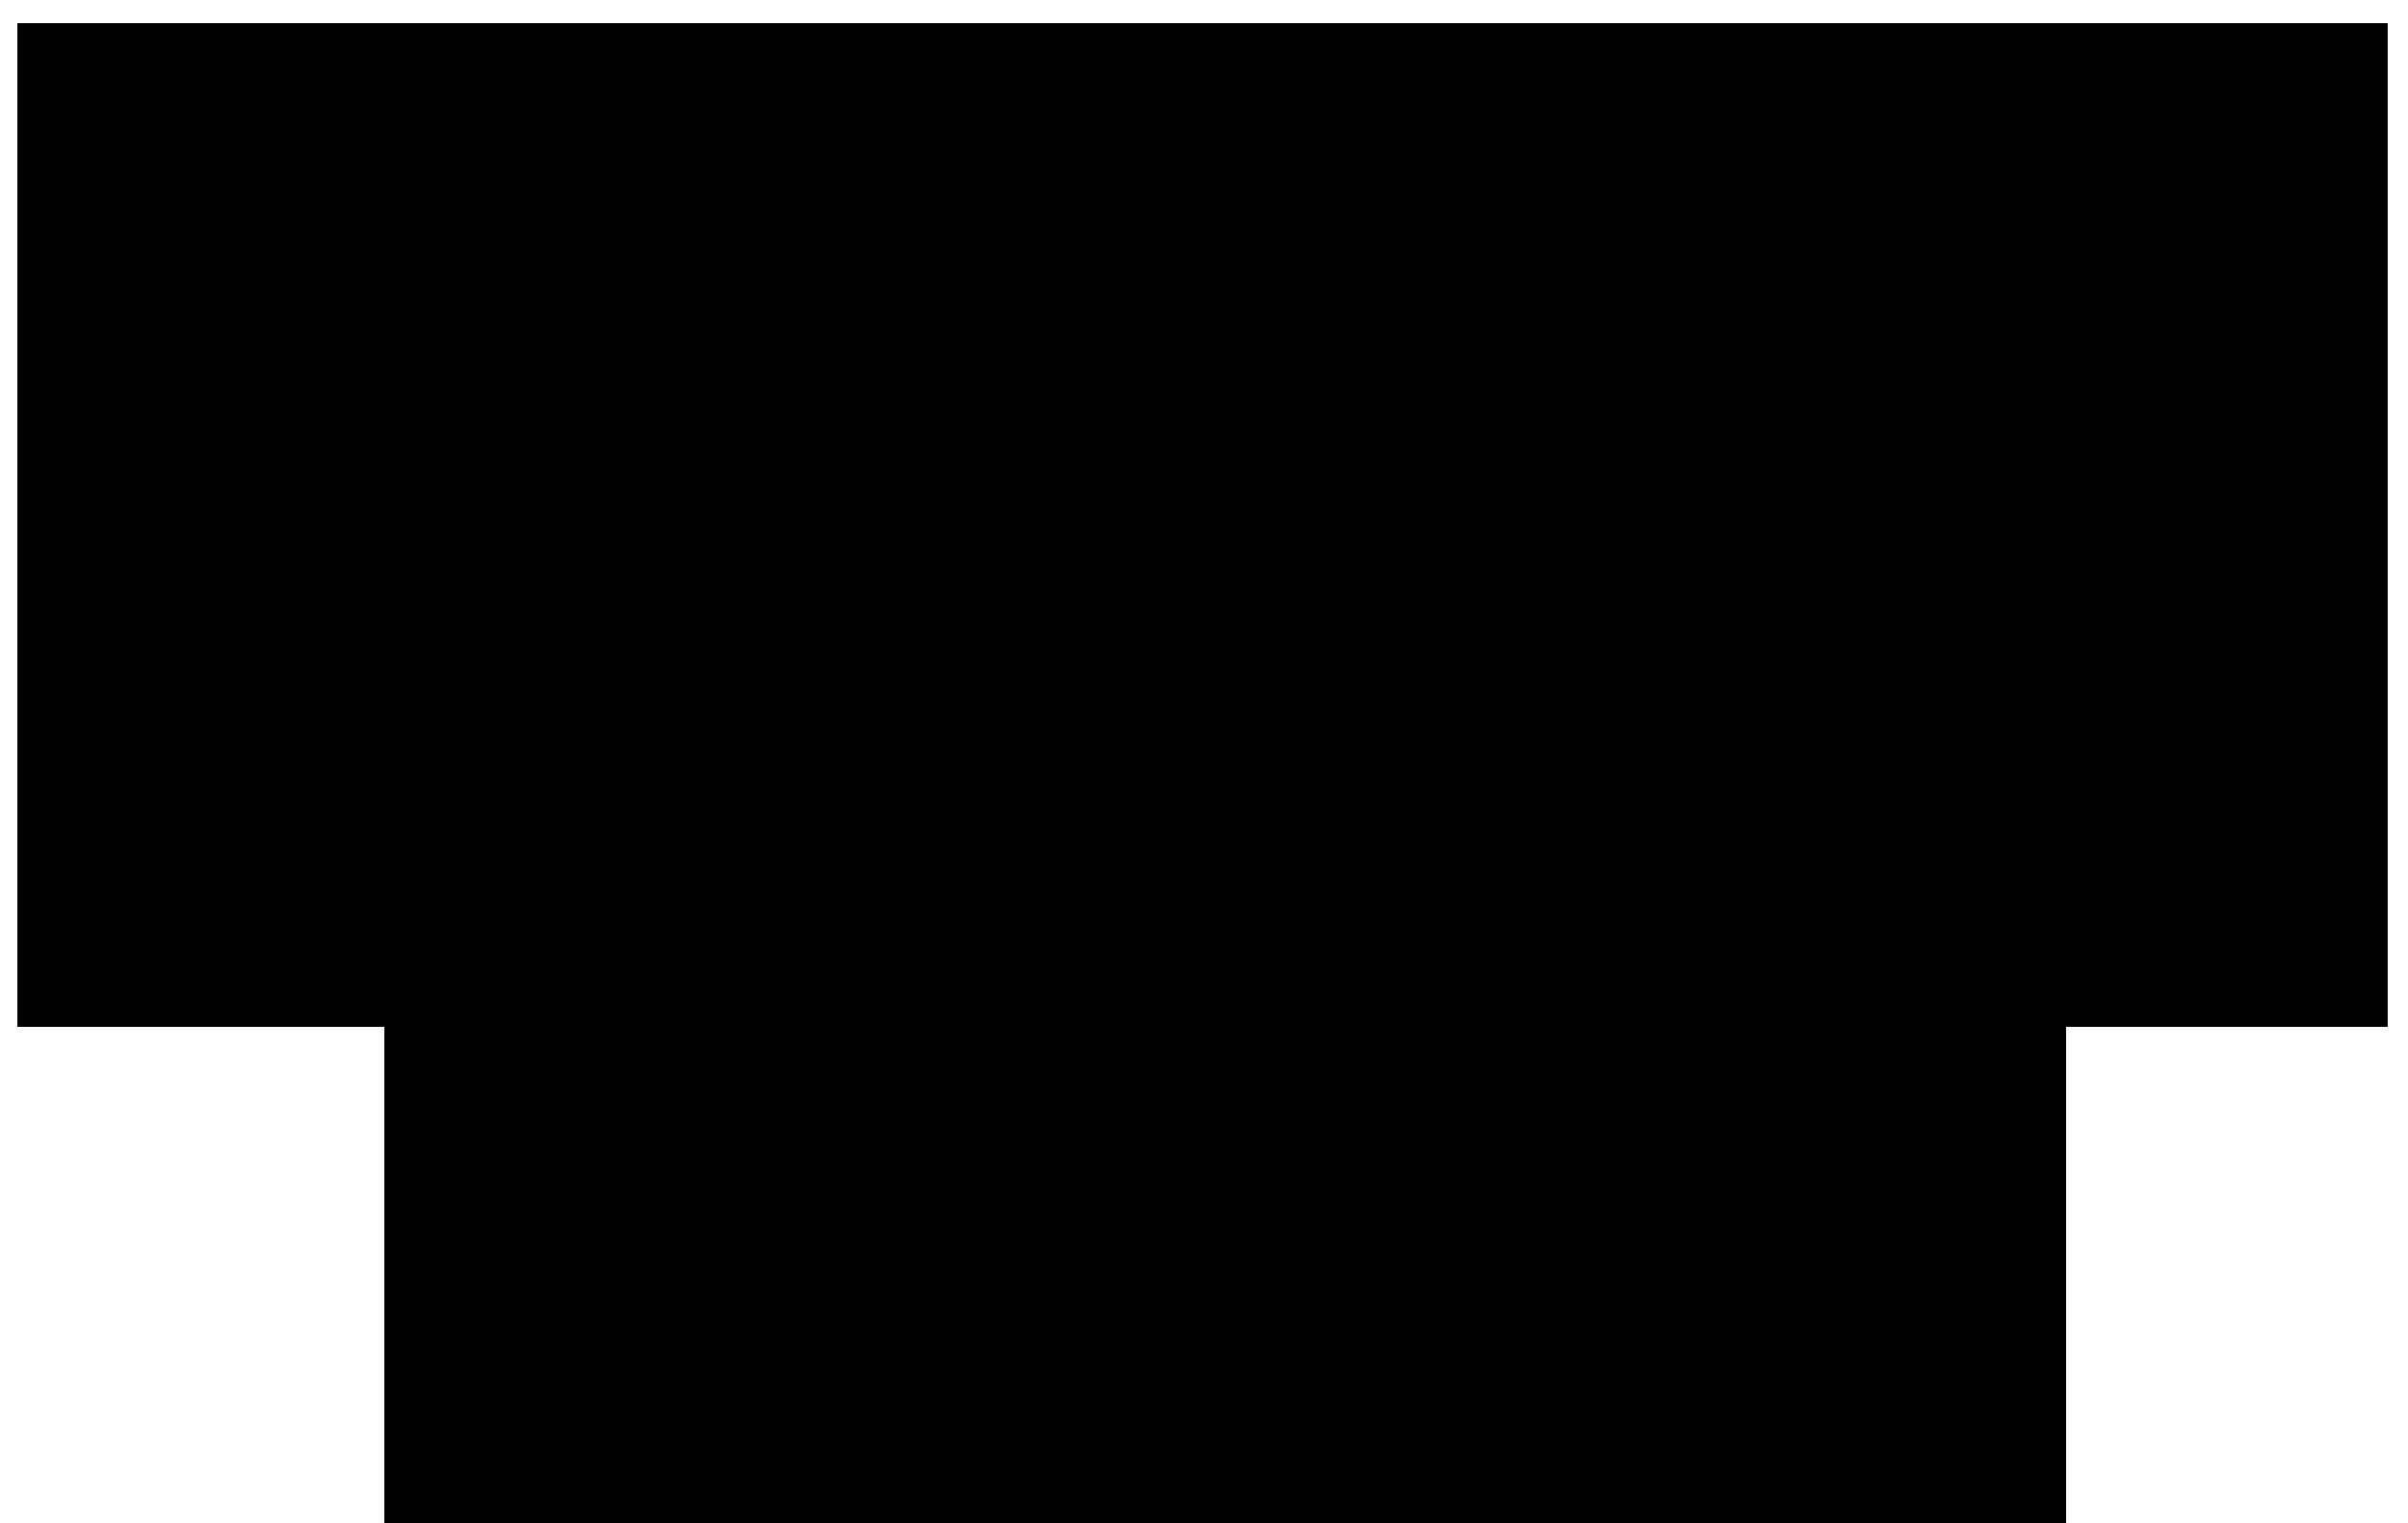 ����� ���� ��� infinite logo collection